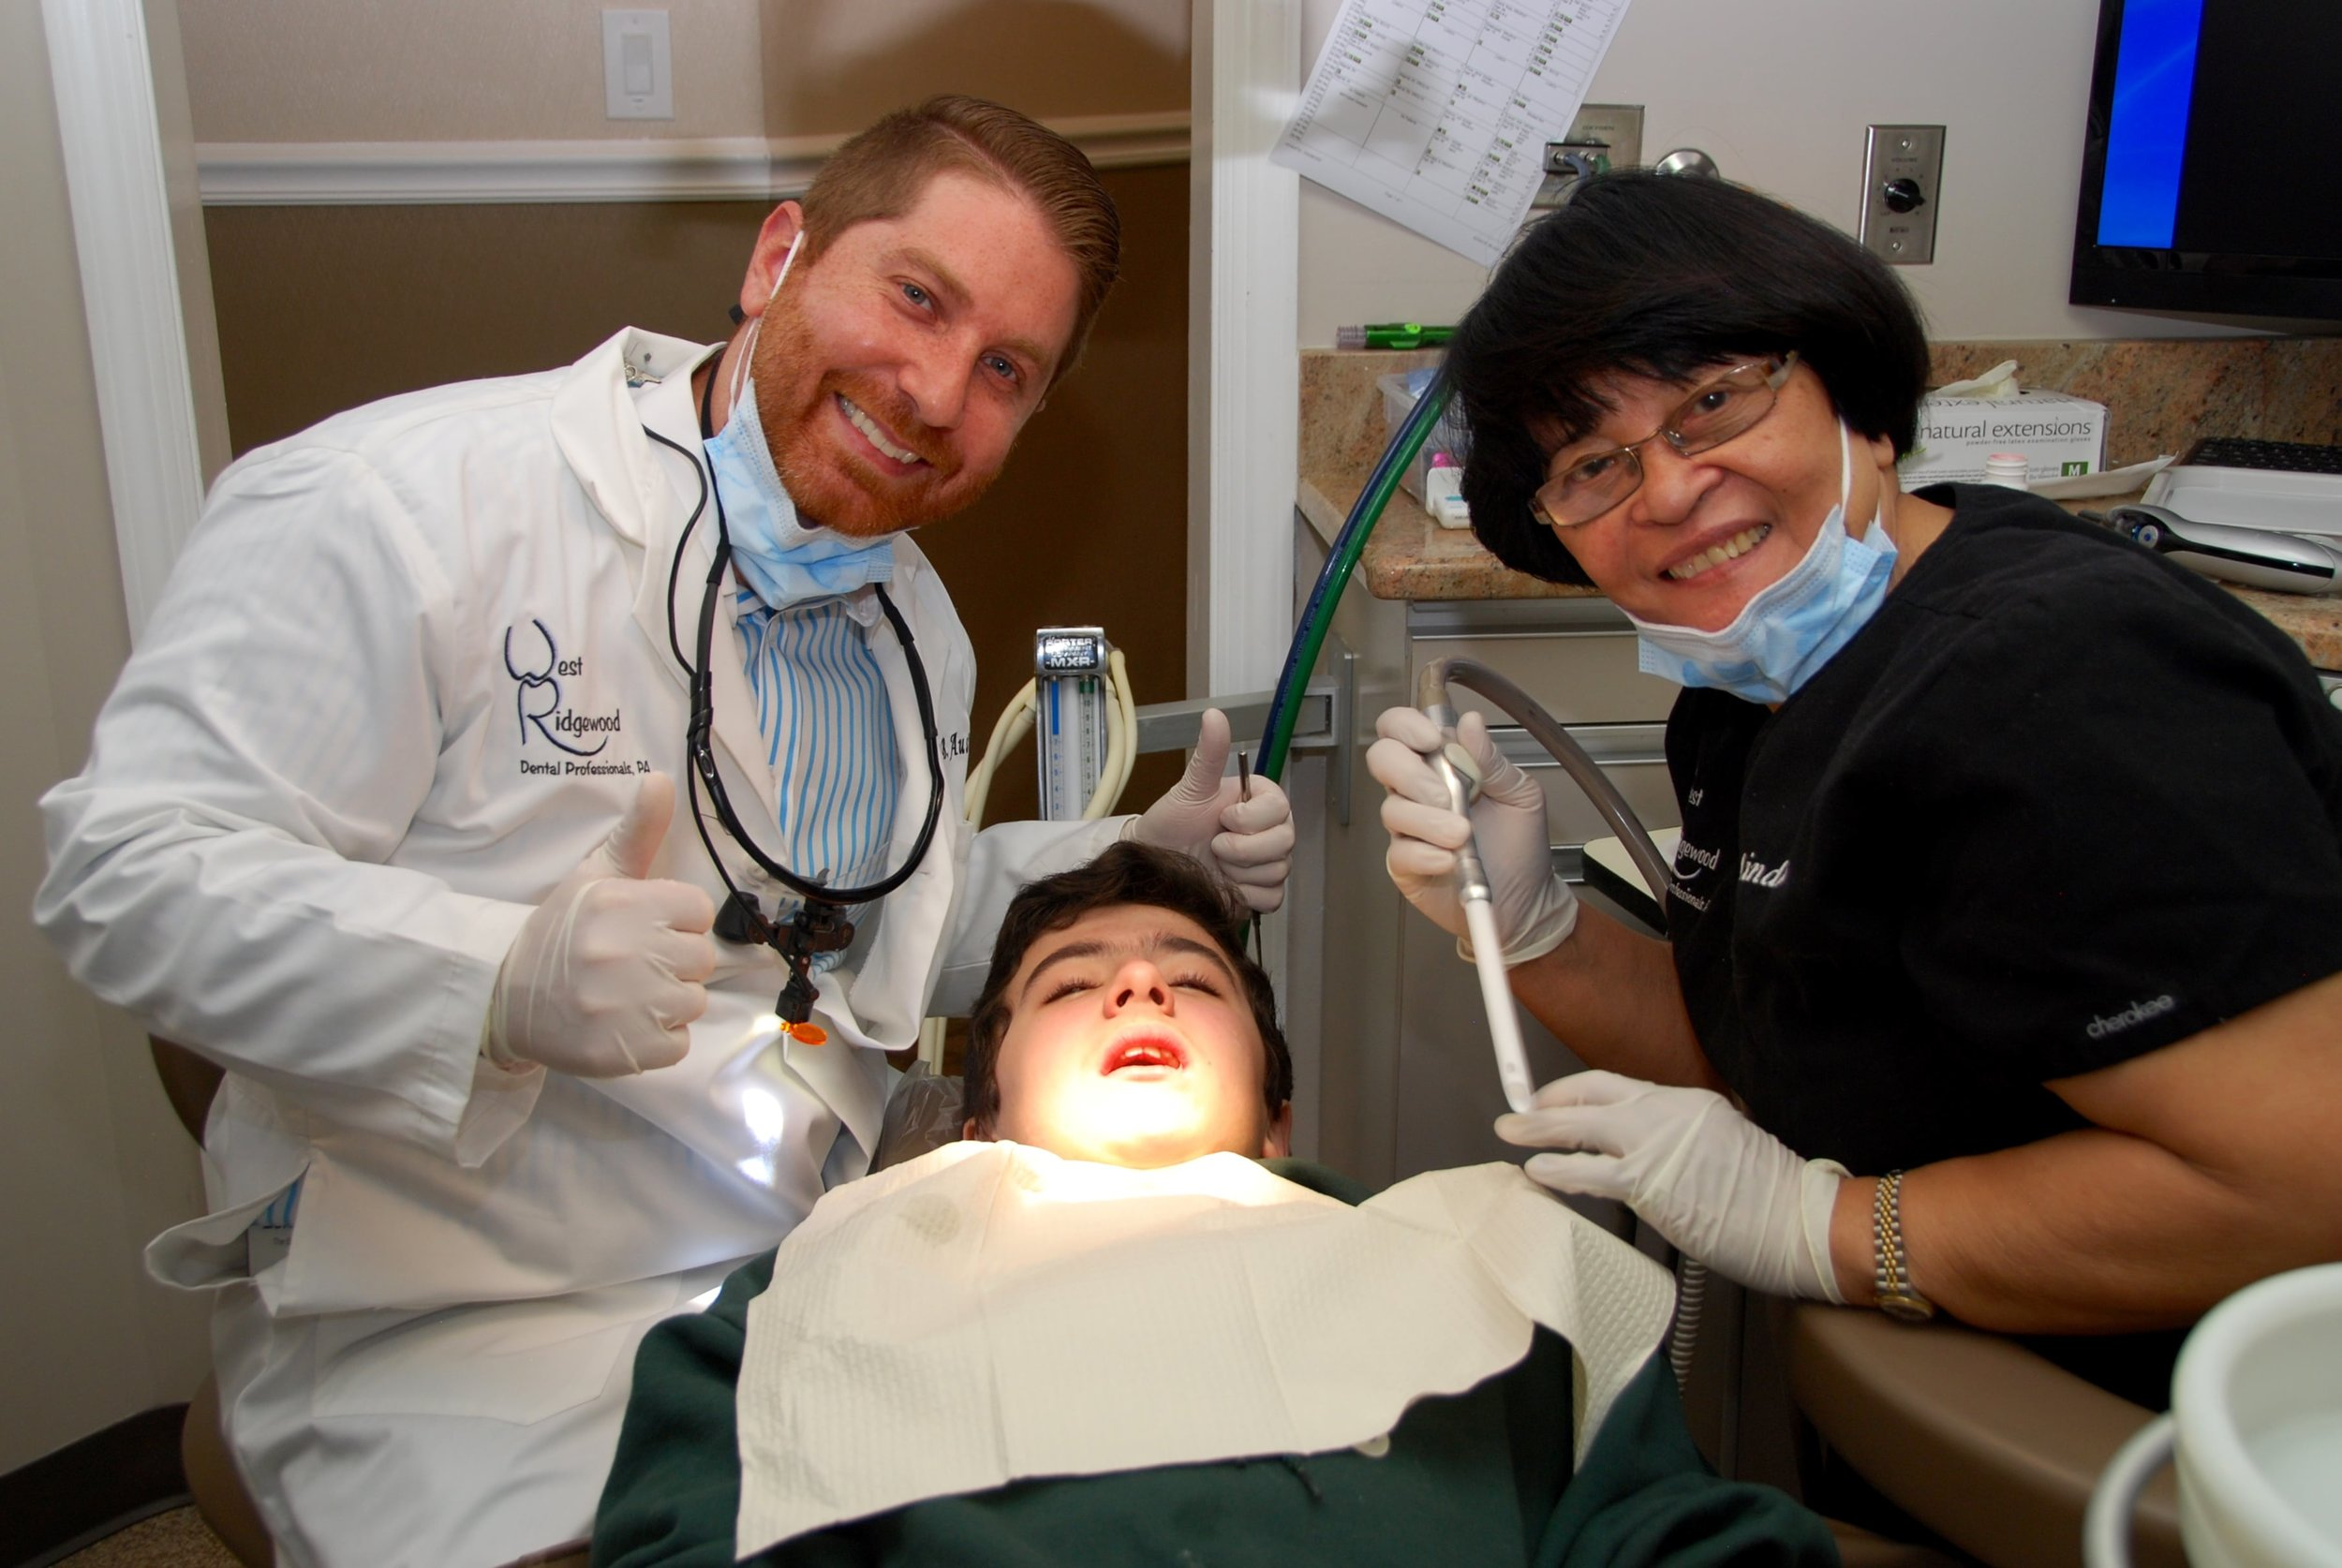 West Ridgewood Dental Professionals - Bergen County Pediatric Dentist